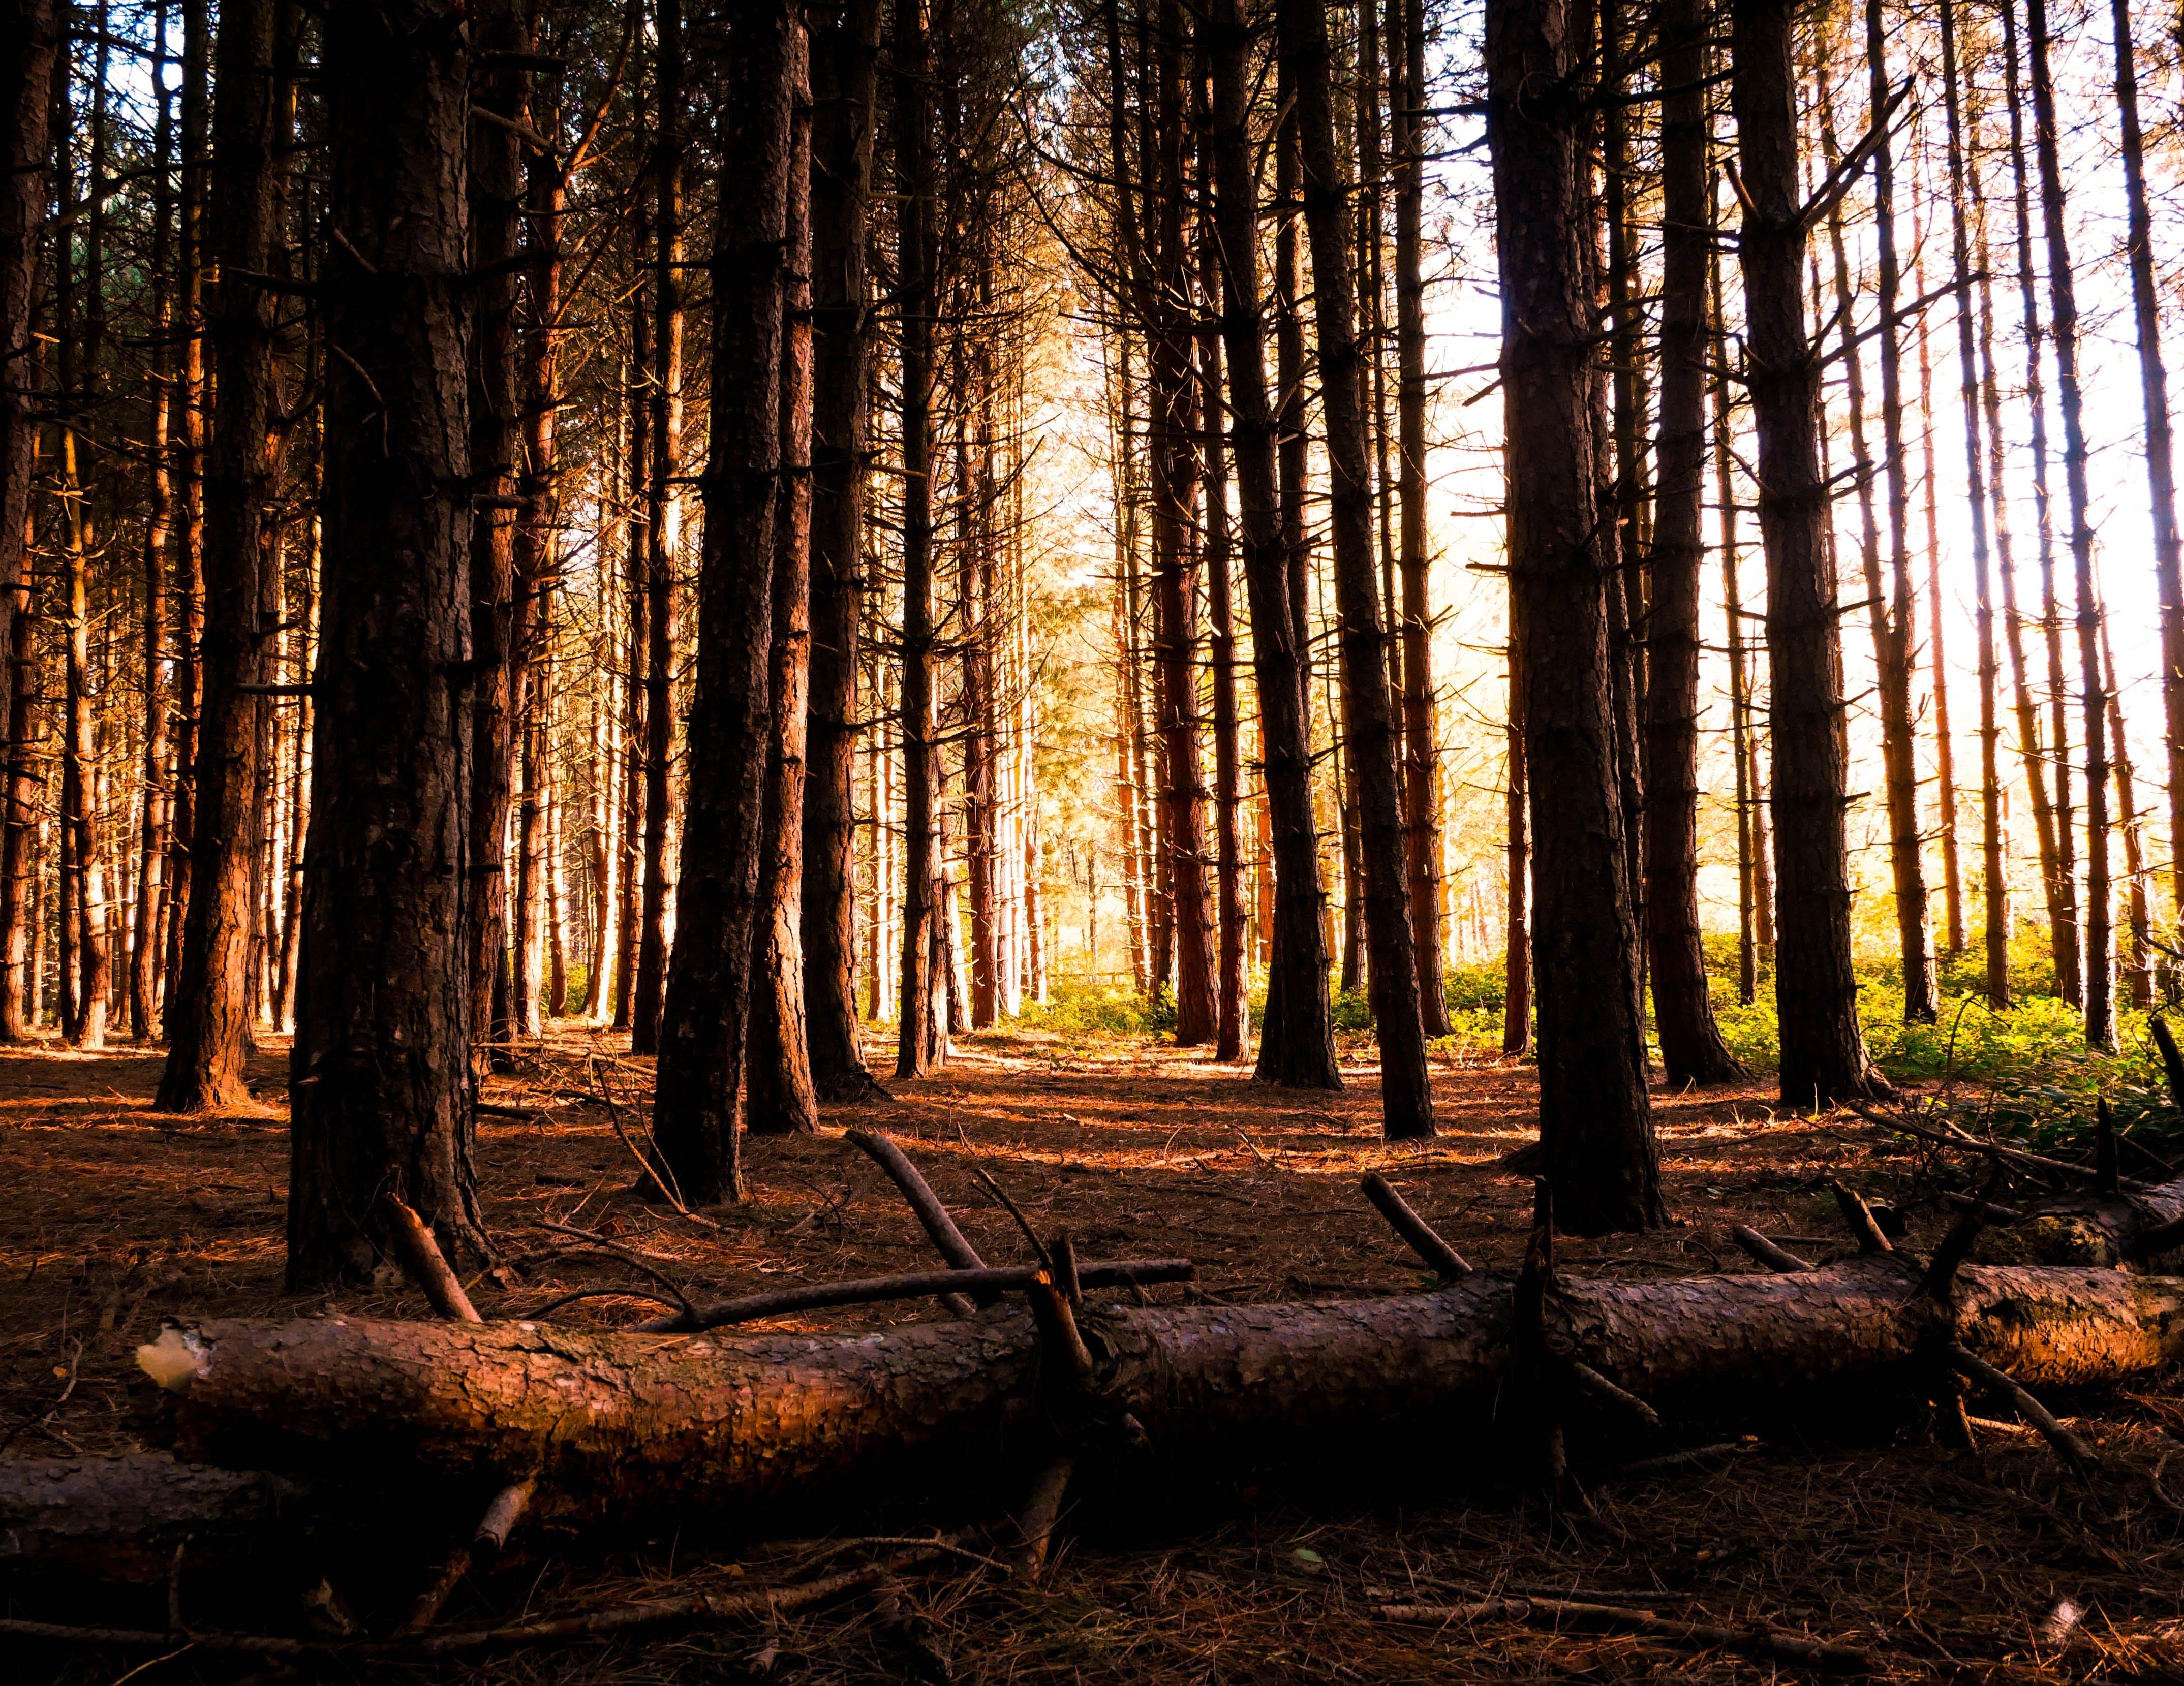 Kostenloses Stock Foto zu Äste, bäume, baumstamm, friedvoll